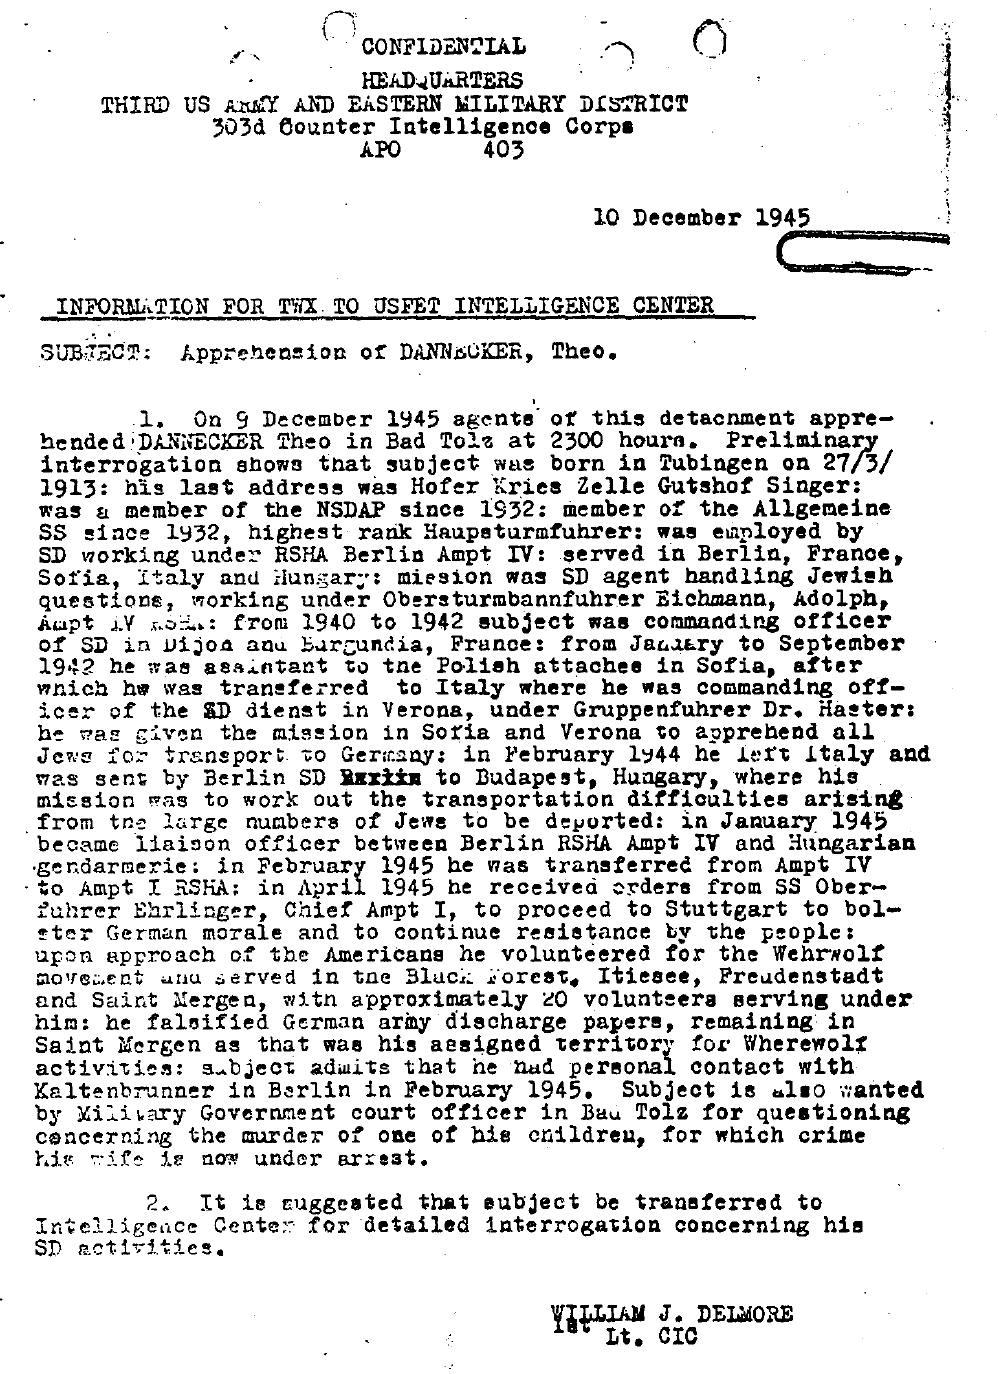 adolf eichmann cia files sample page 1